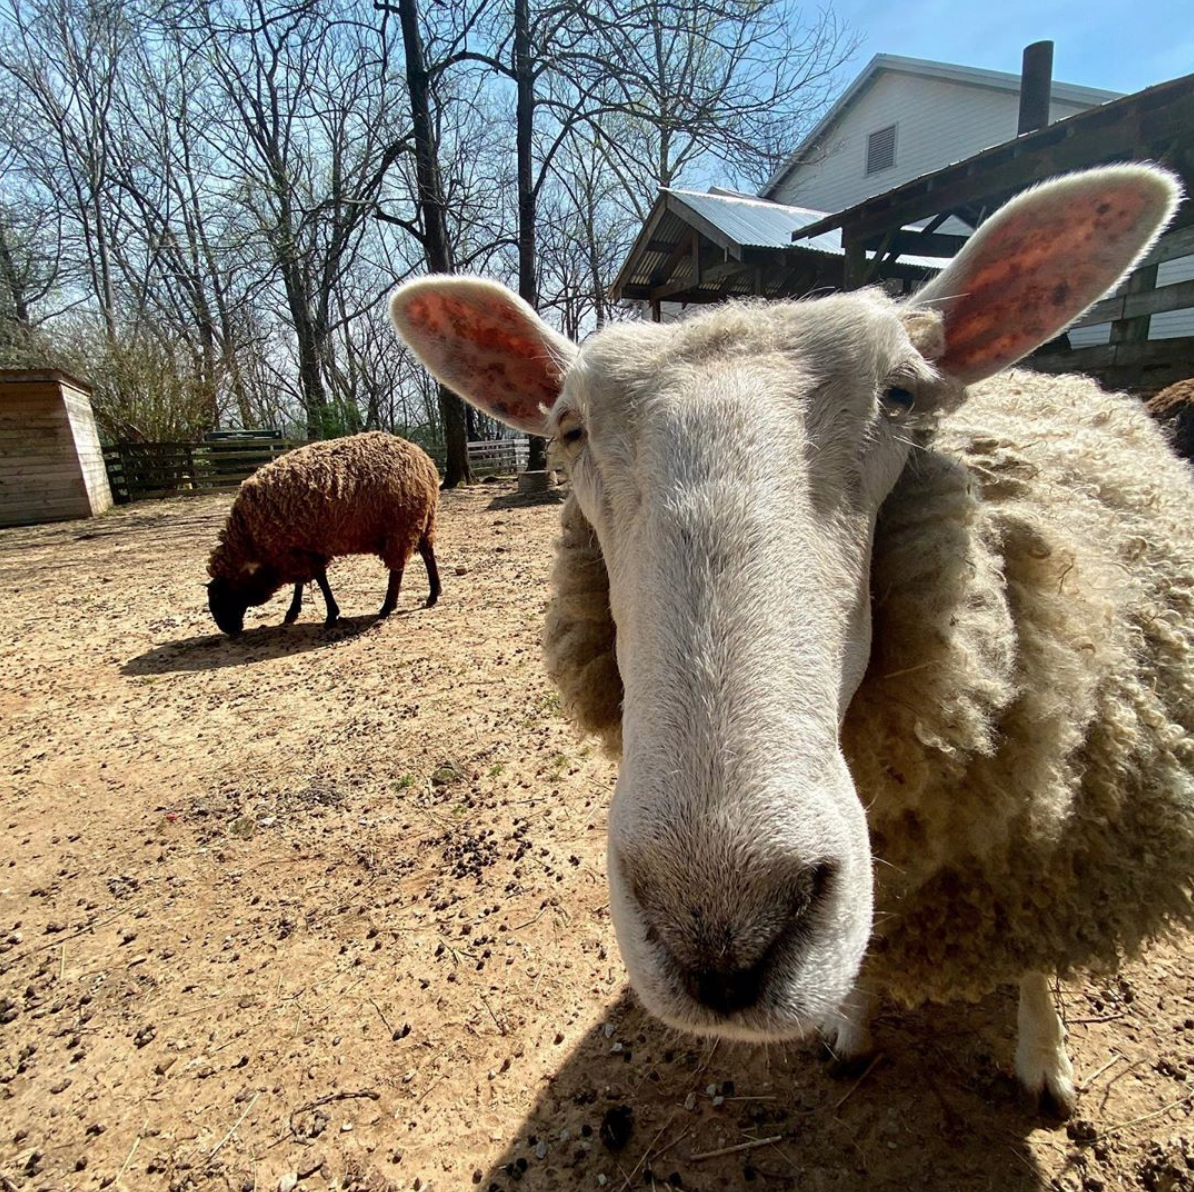 burritt on the mountain sheep